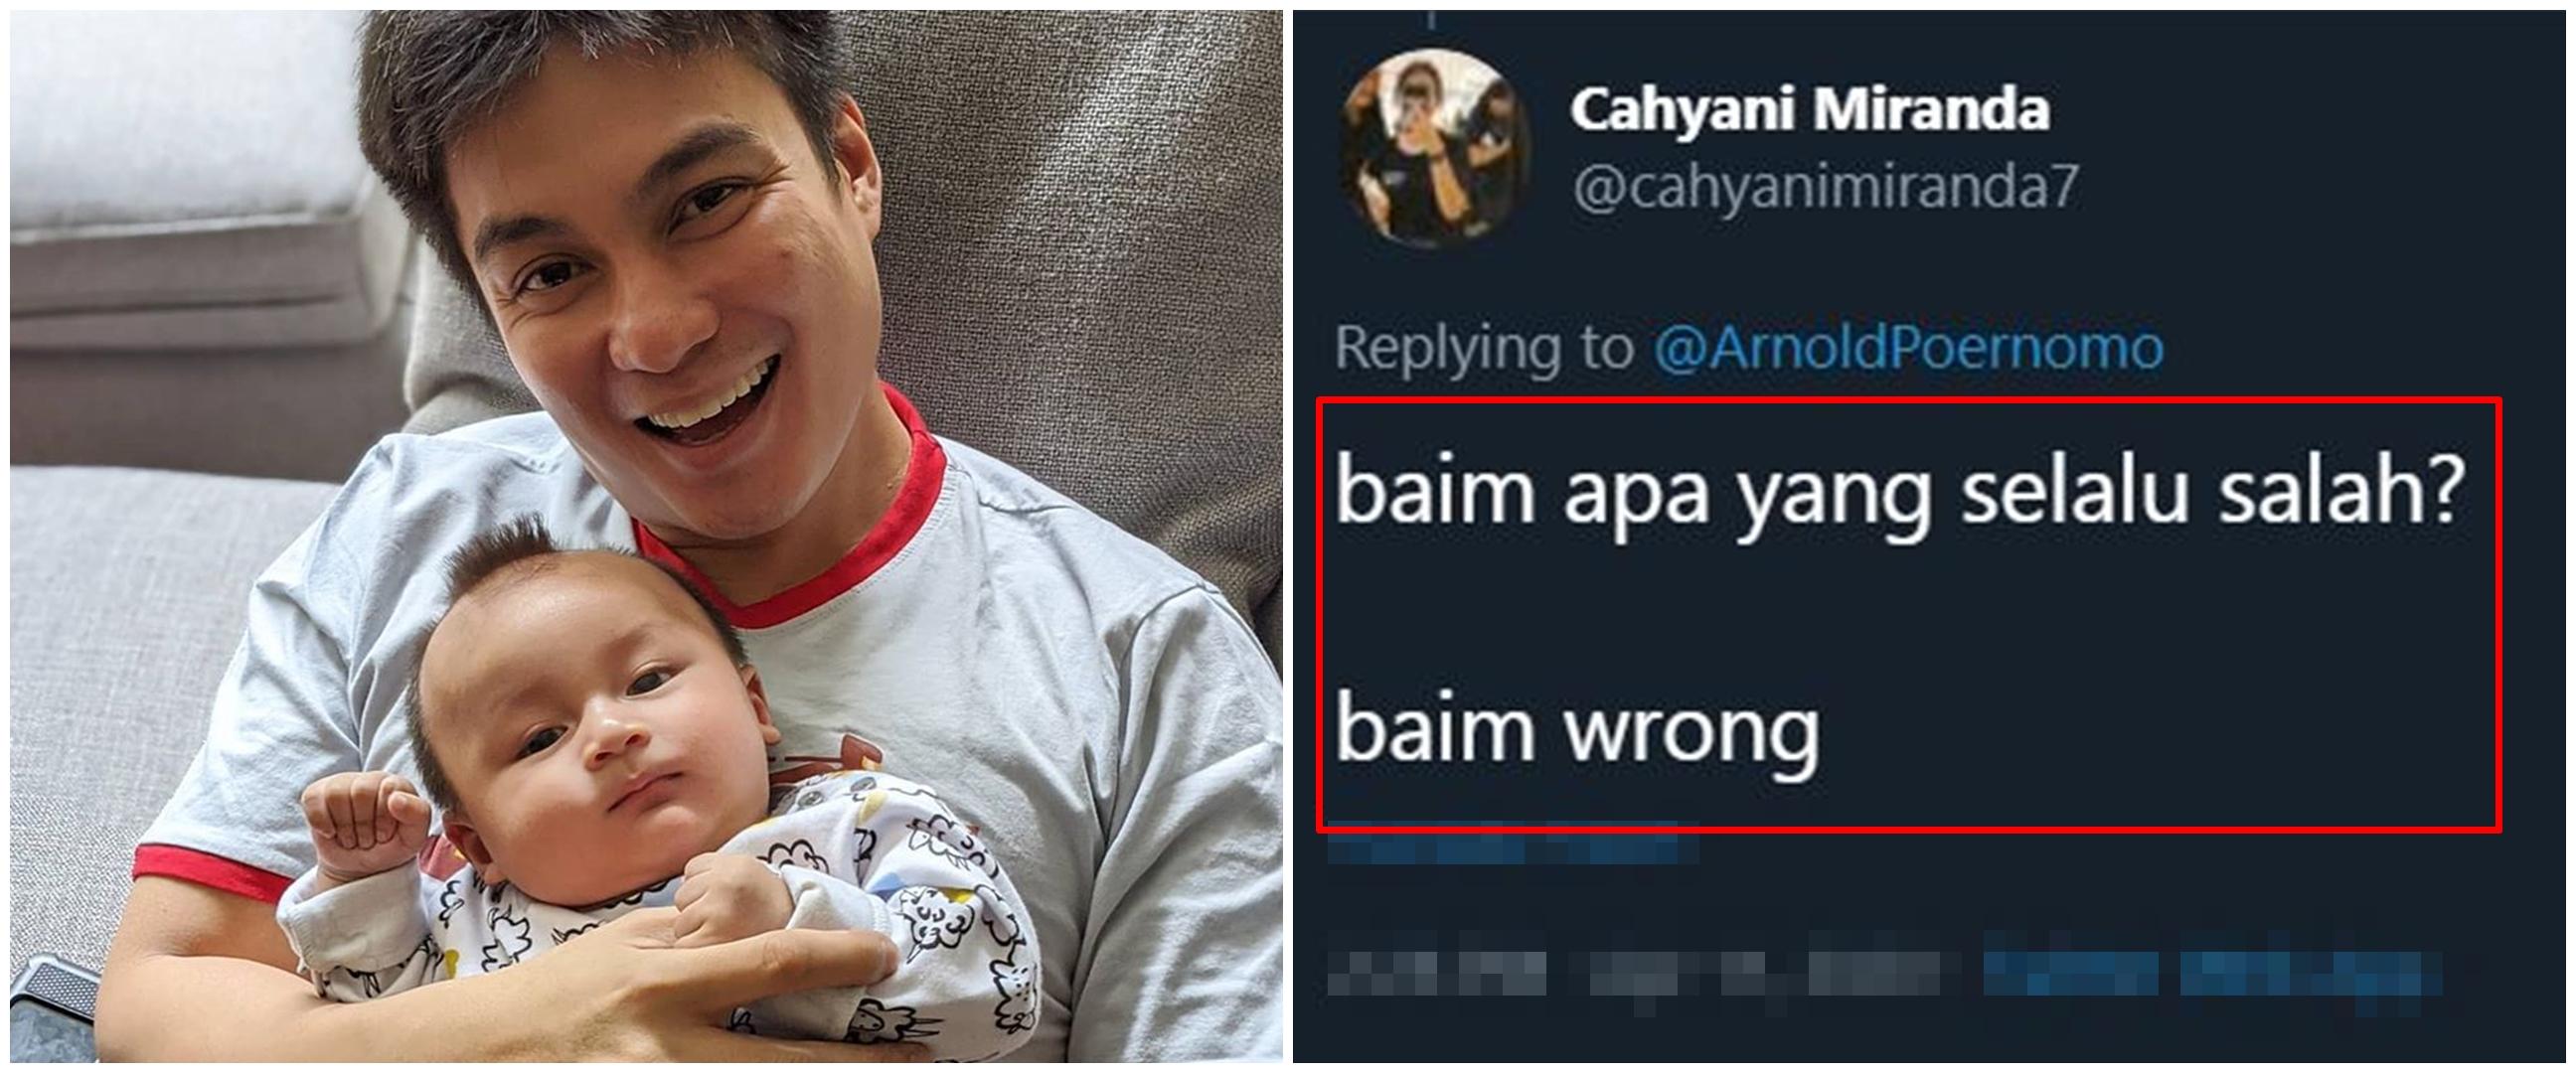 10 Cuitan lucu pelesetan nama Baim Wong ini bikin ngakak